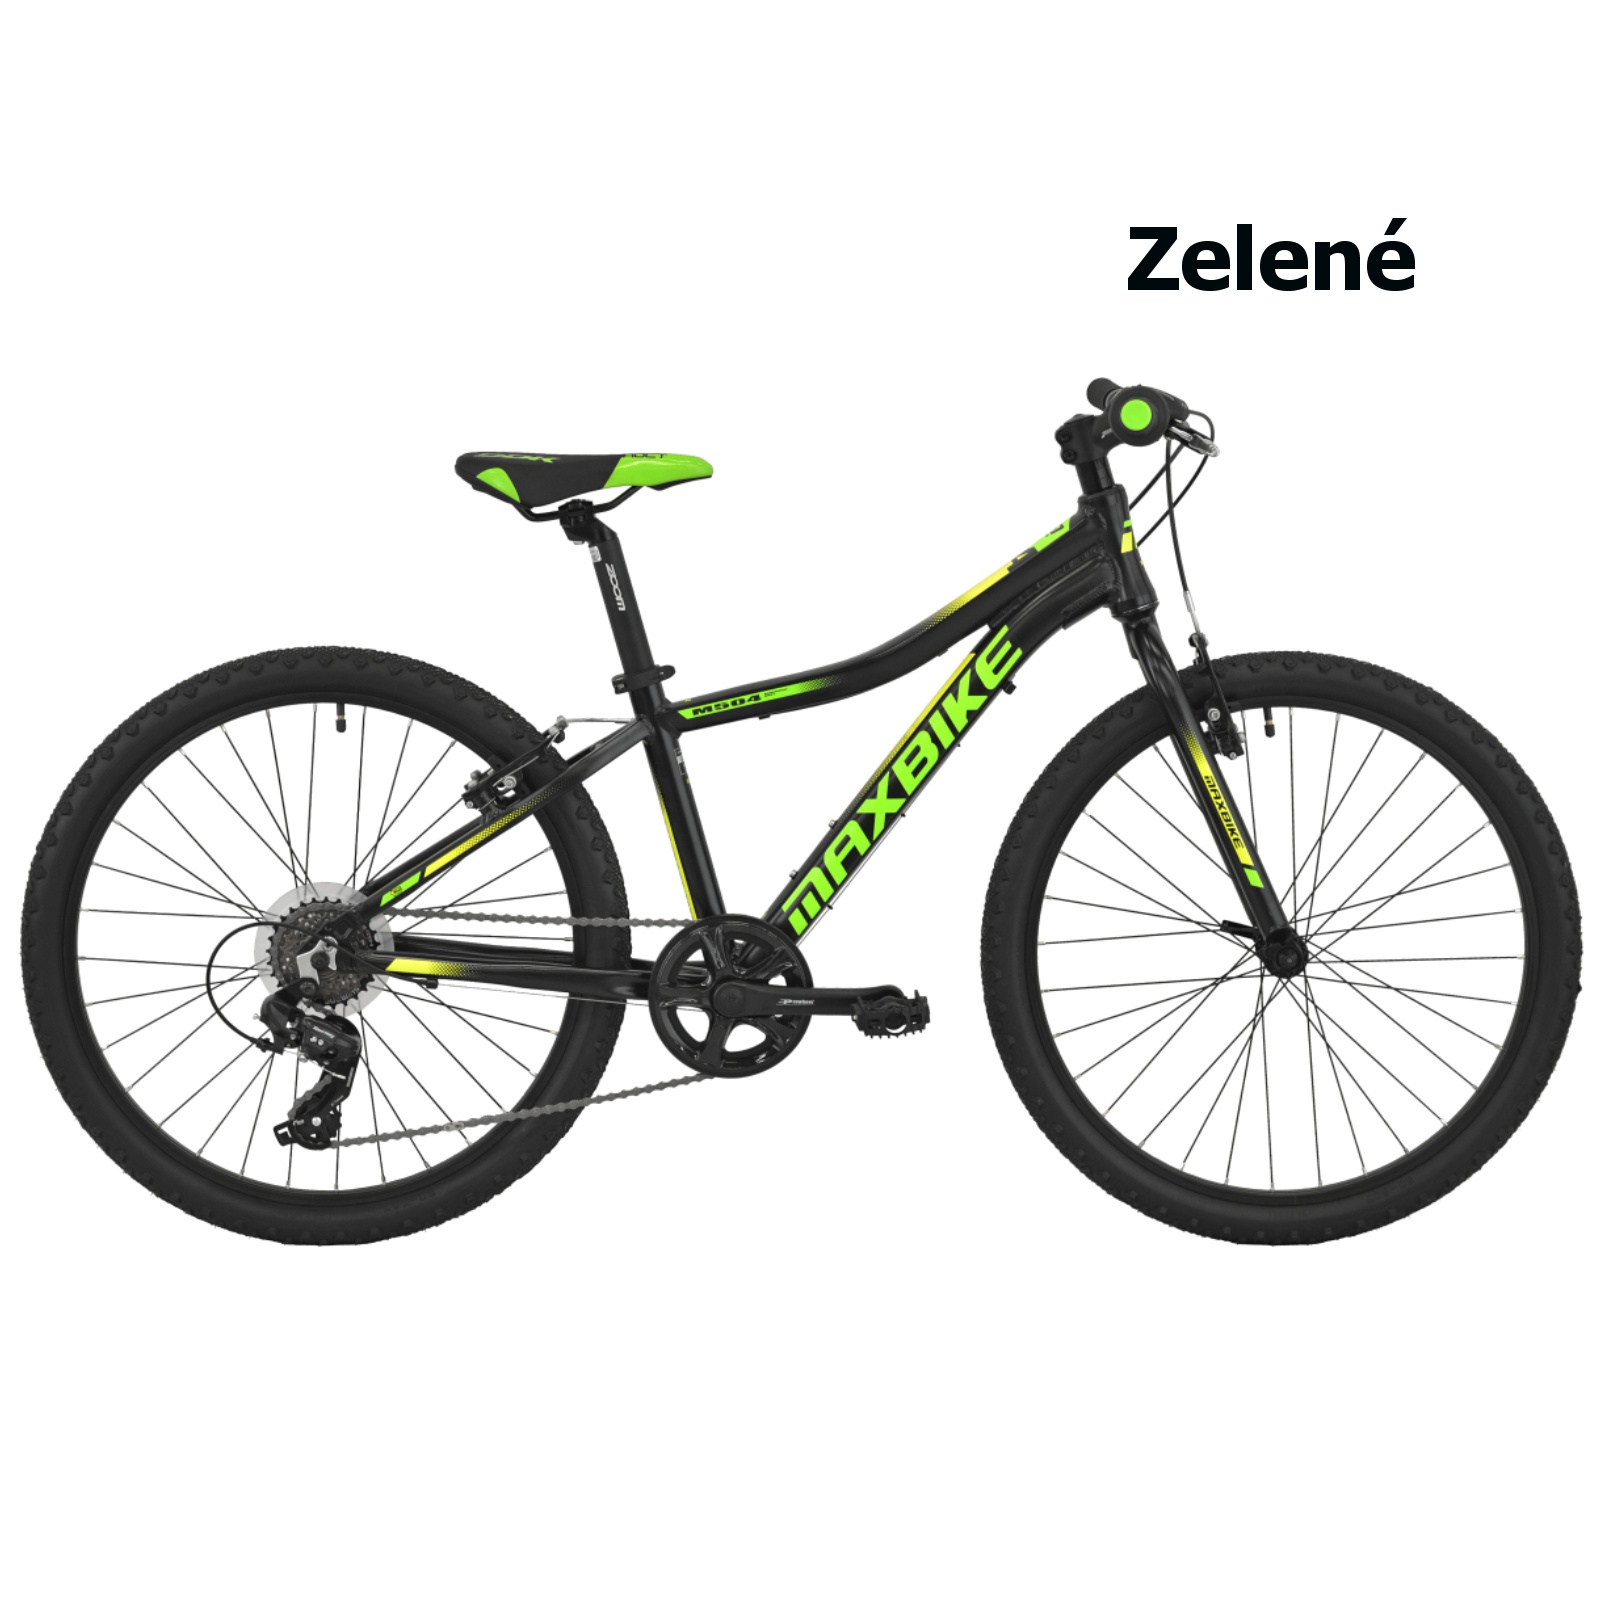 Maxbike Denali 2020